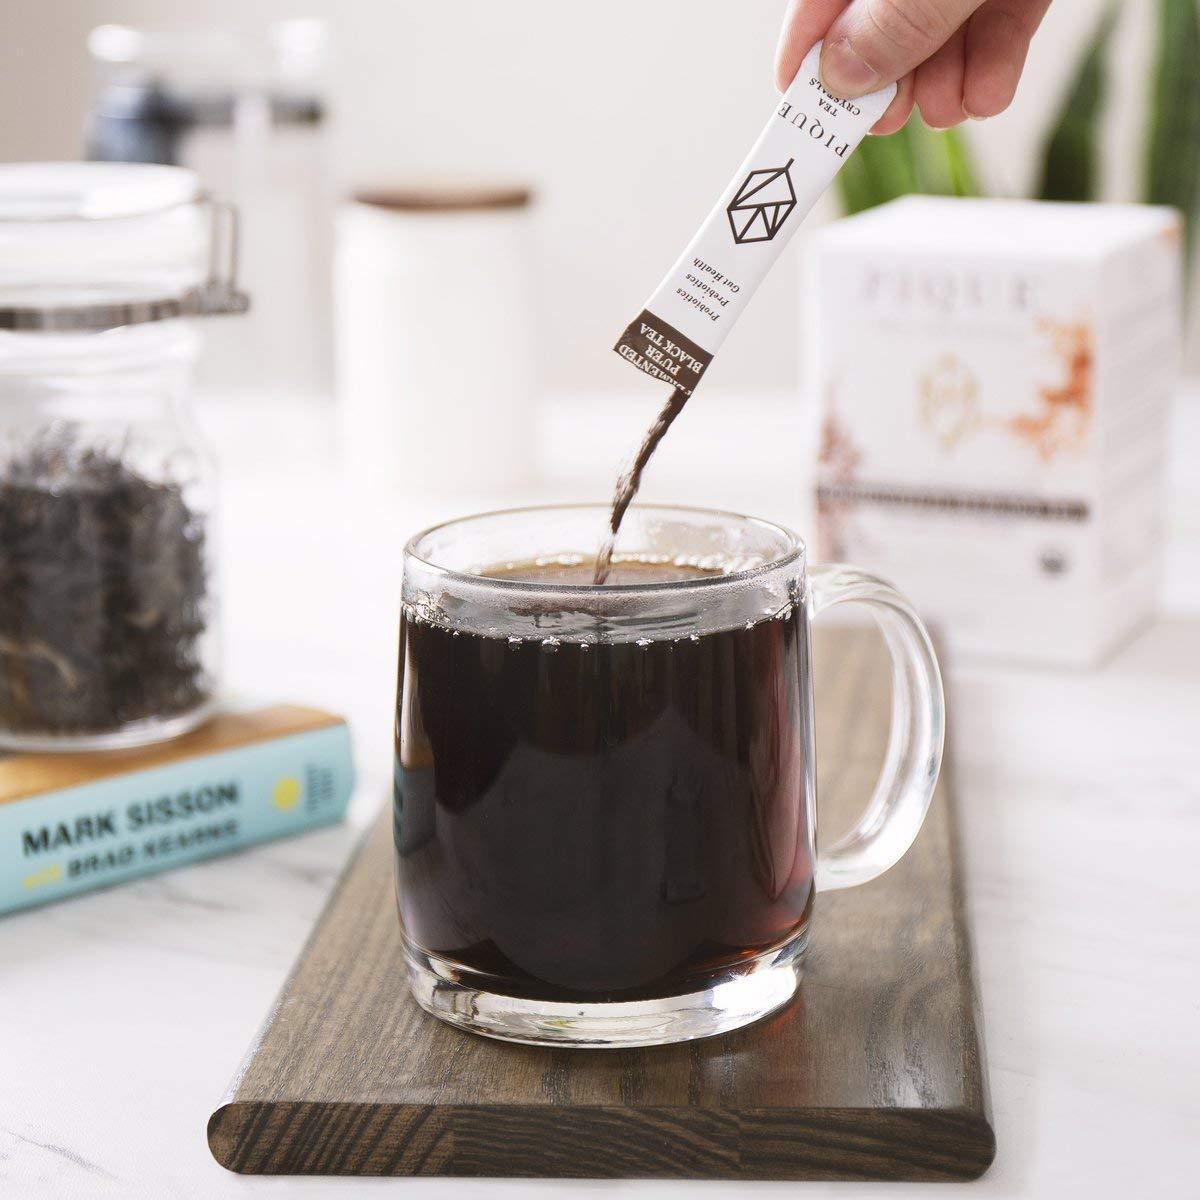 Pique Tea Organic Fermented Pu'er Black Tea - Immune Support, Gut Health, Fasting